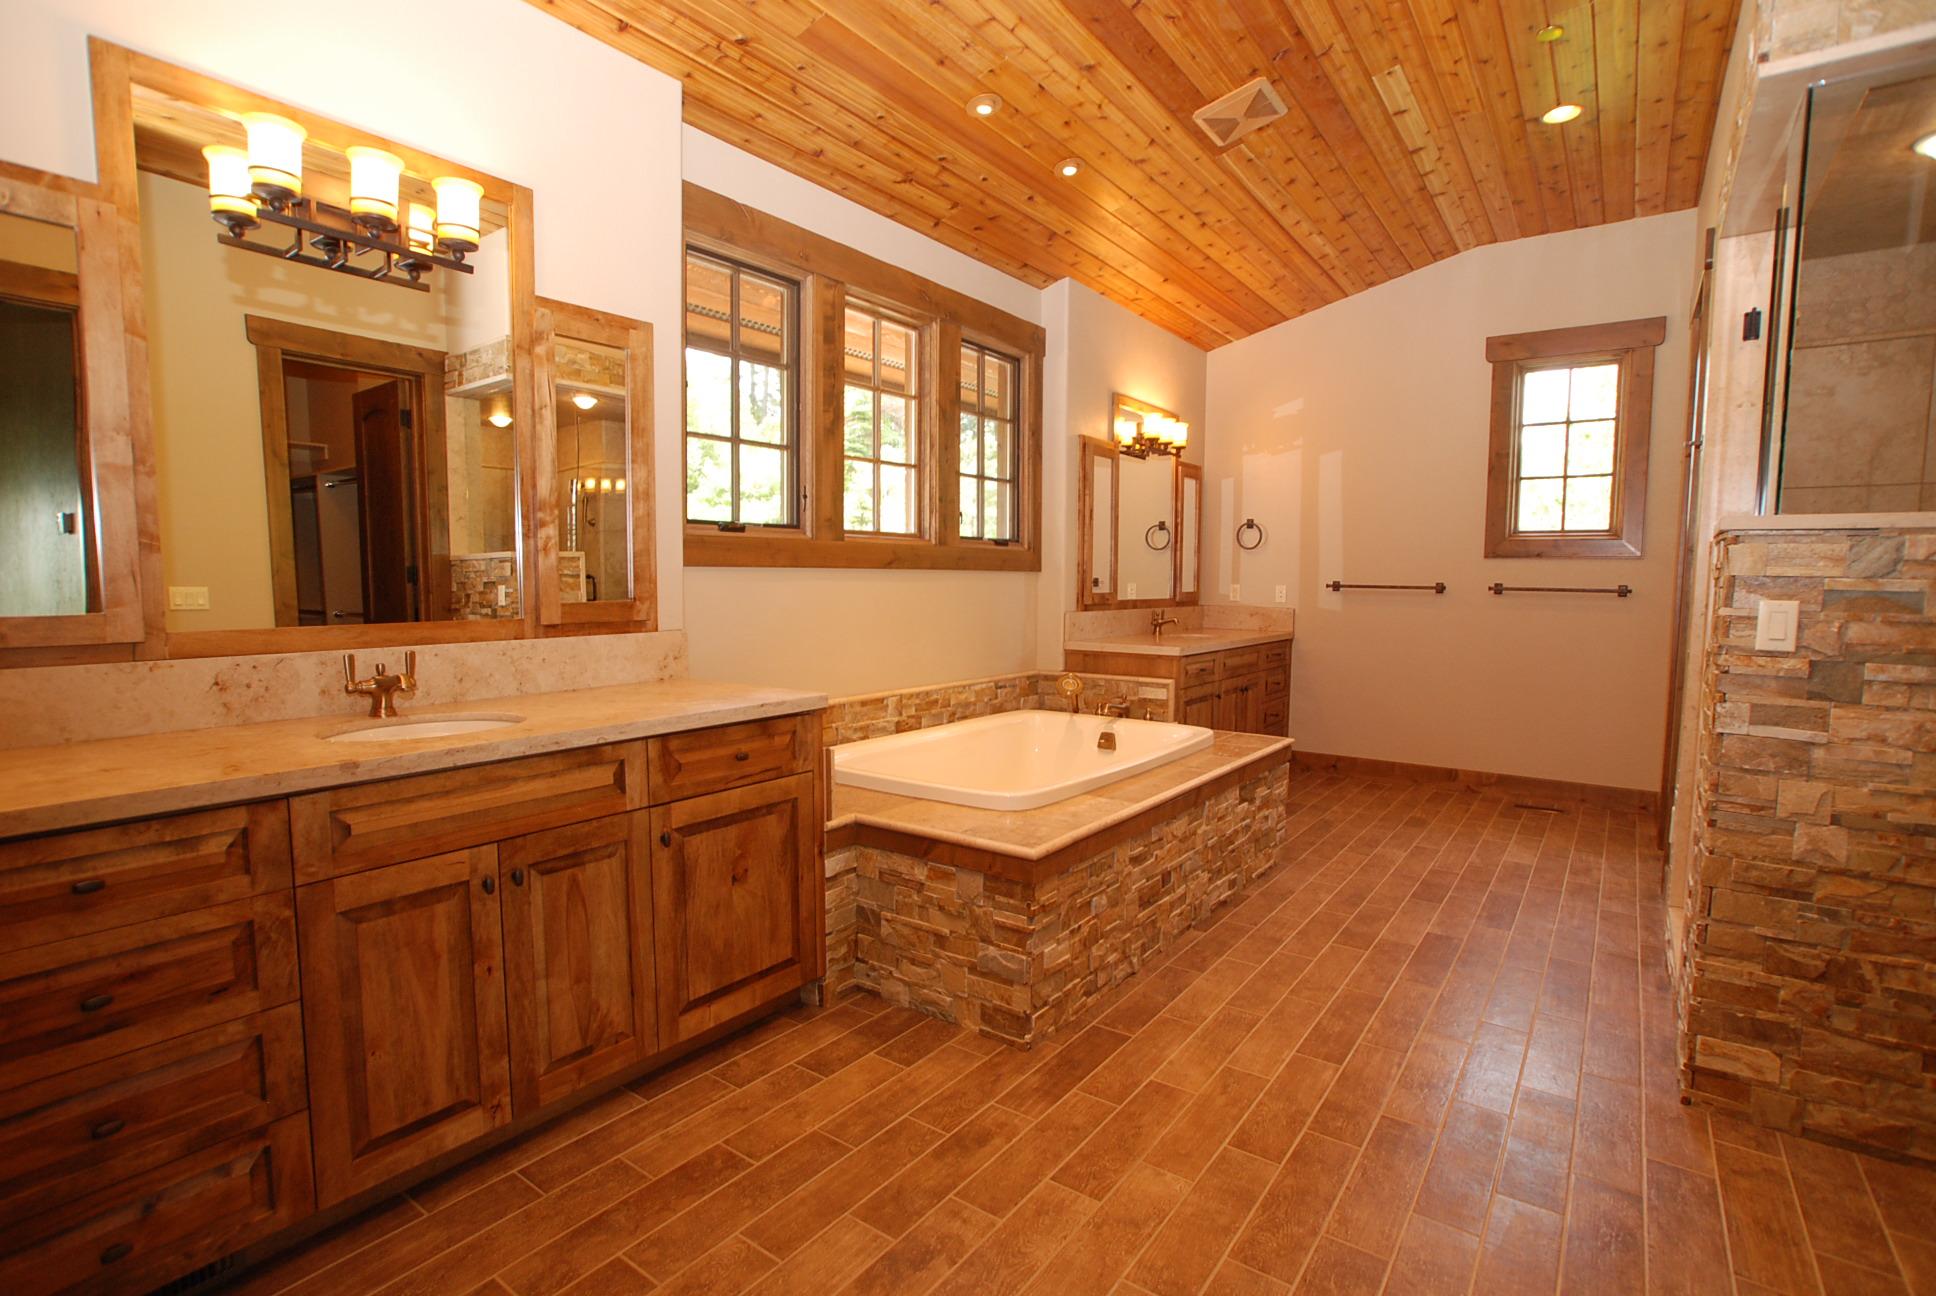 Gozzer Ranch Lot 10 Home by Matt Fisher of Shelter Associates